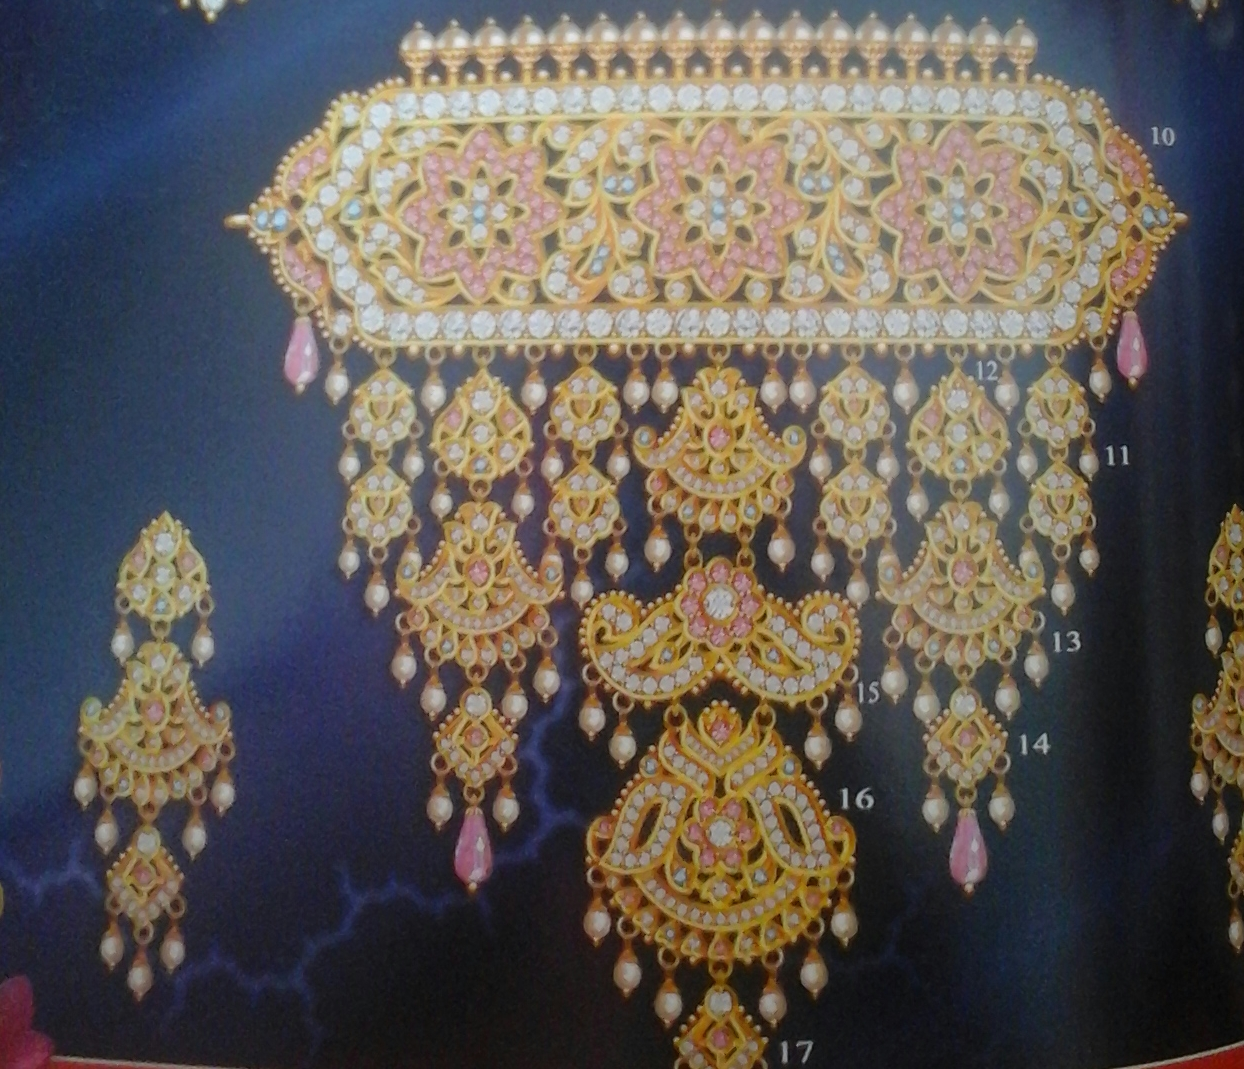 Rajputi jewellery AAD (Necklace) 2016 | Culture of Rajasthan